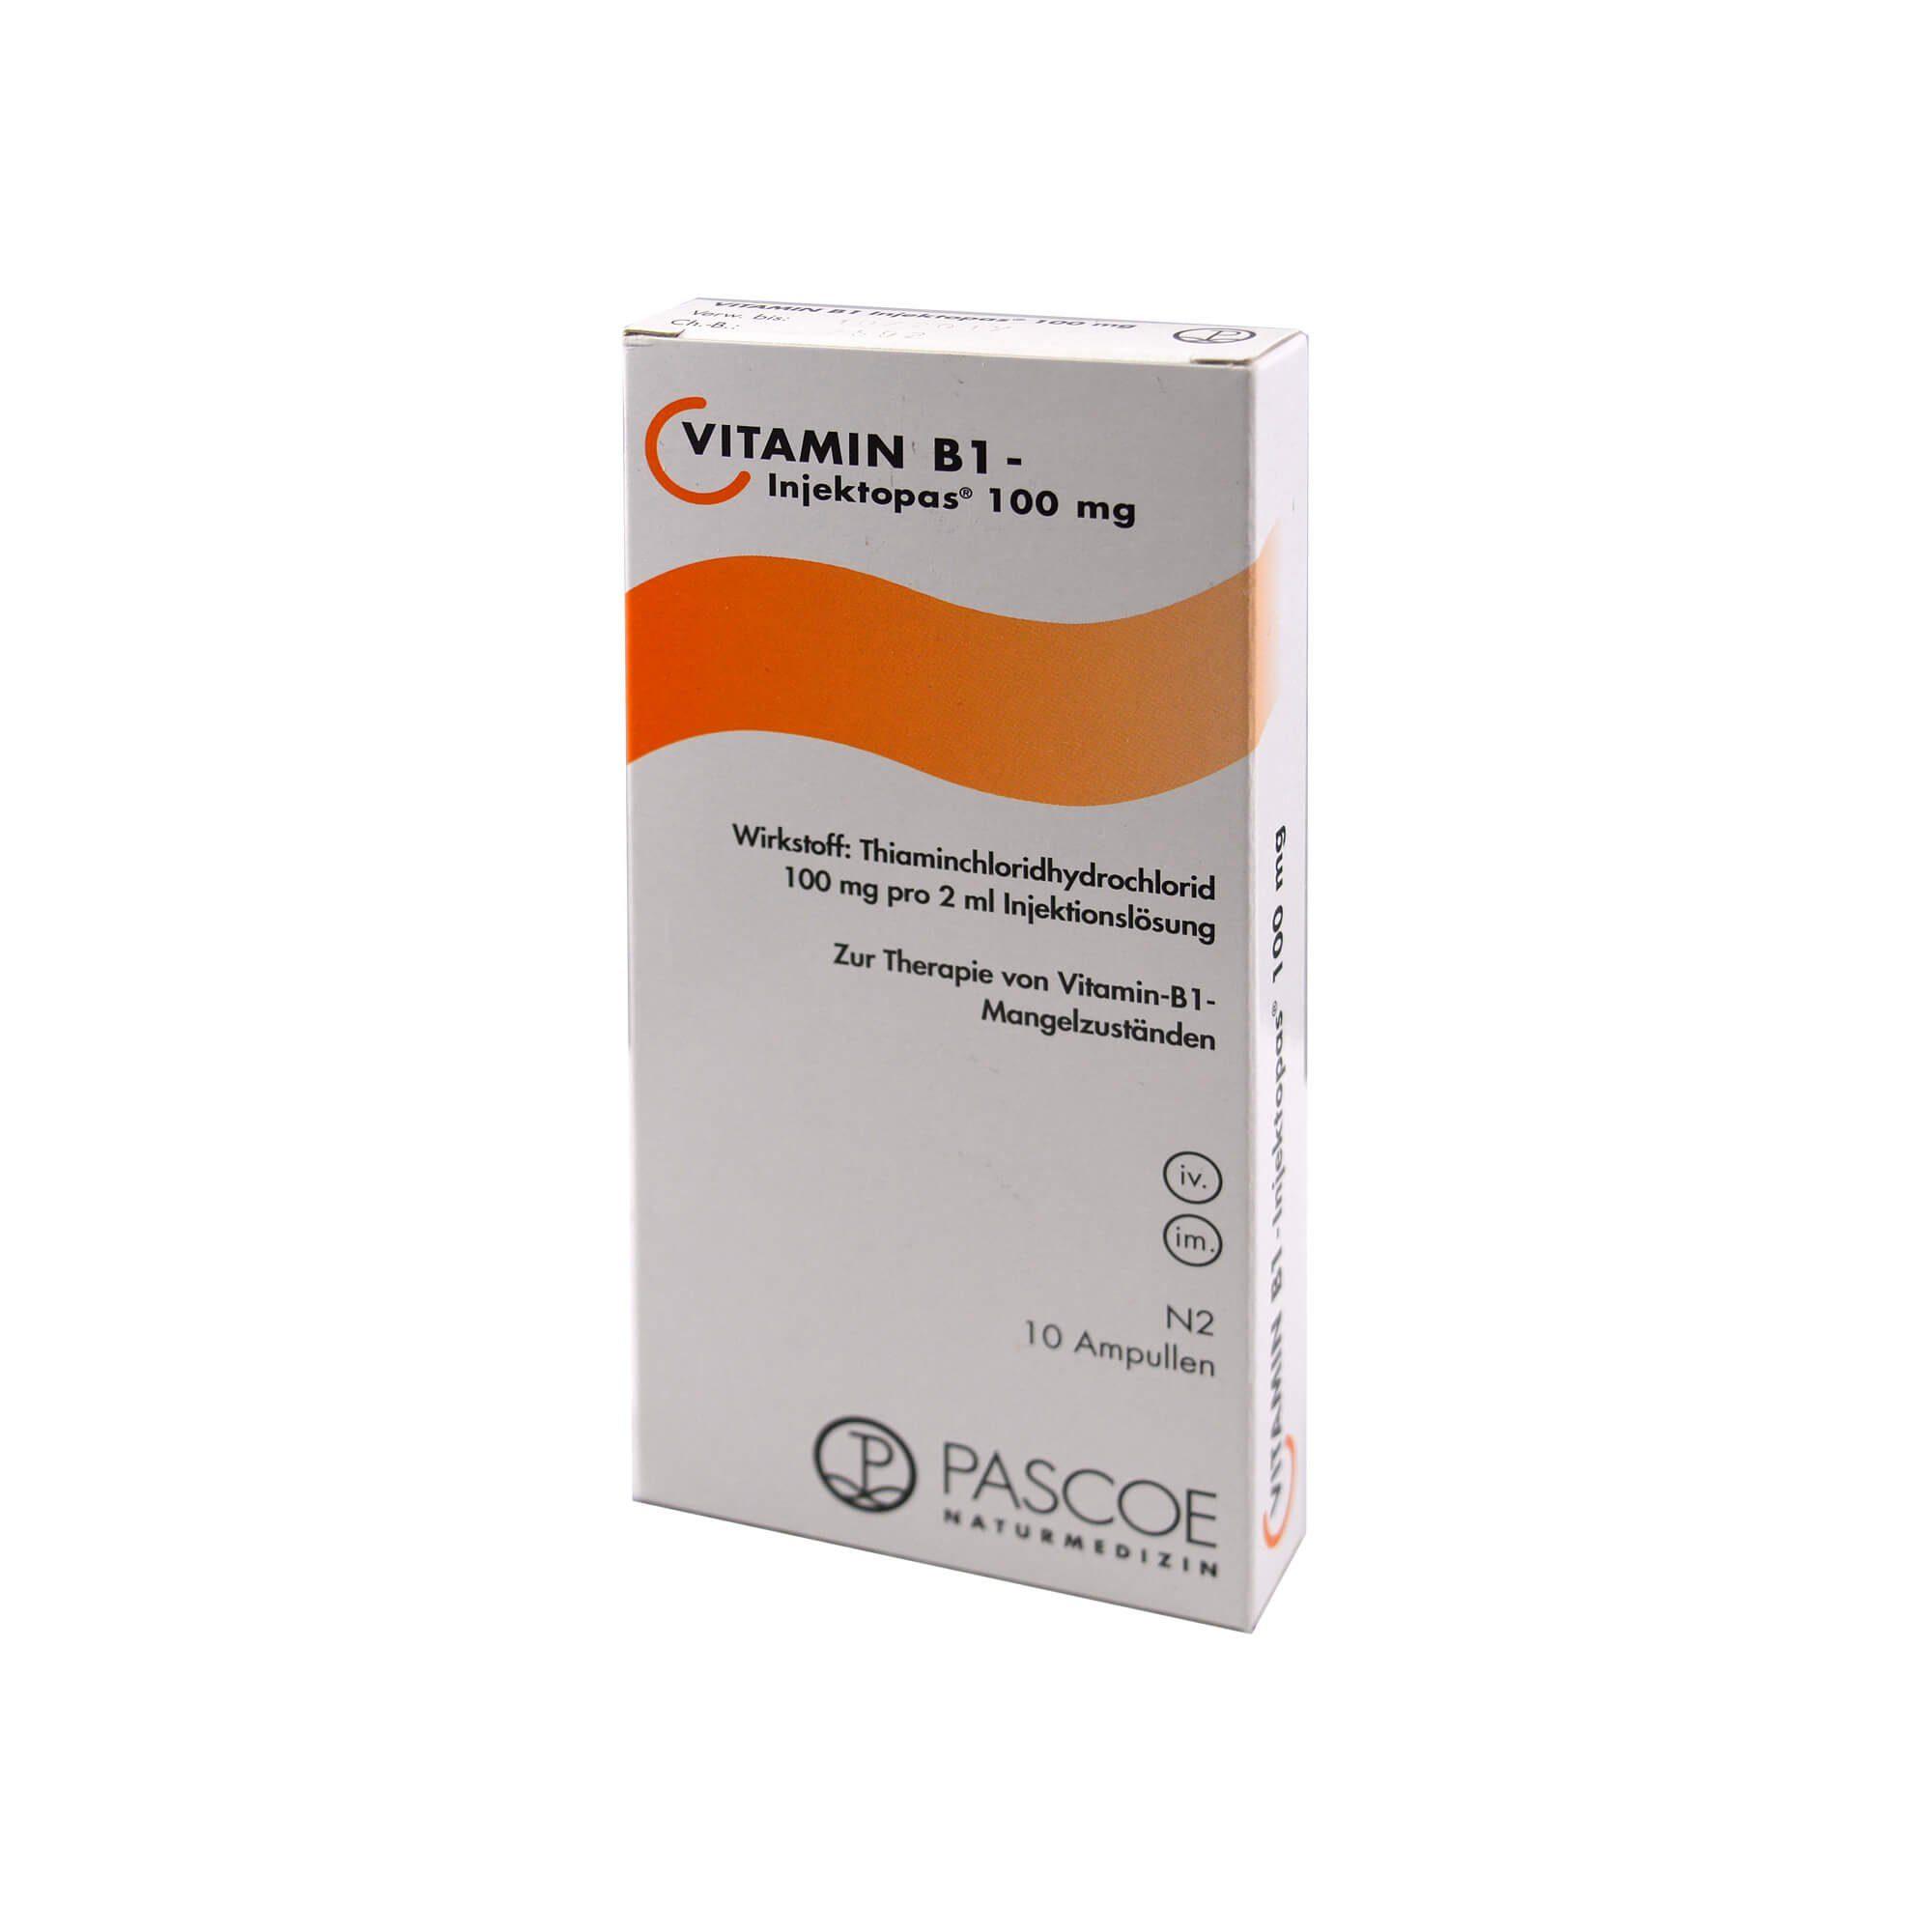 Vitamin B1 Injektopas 100 Mg Injektionslösung , 10X2 ml